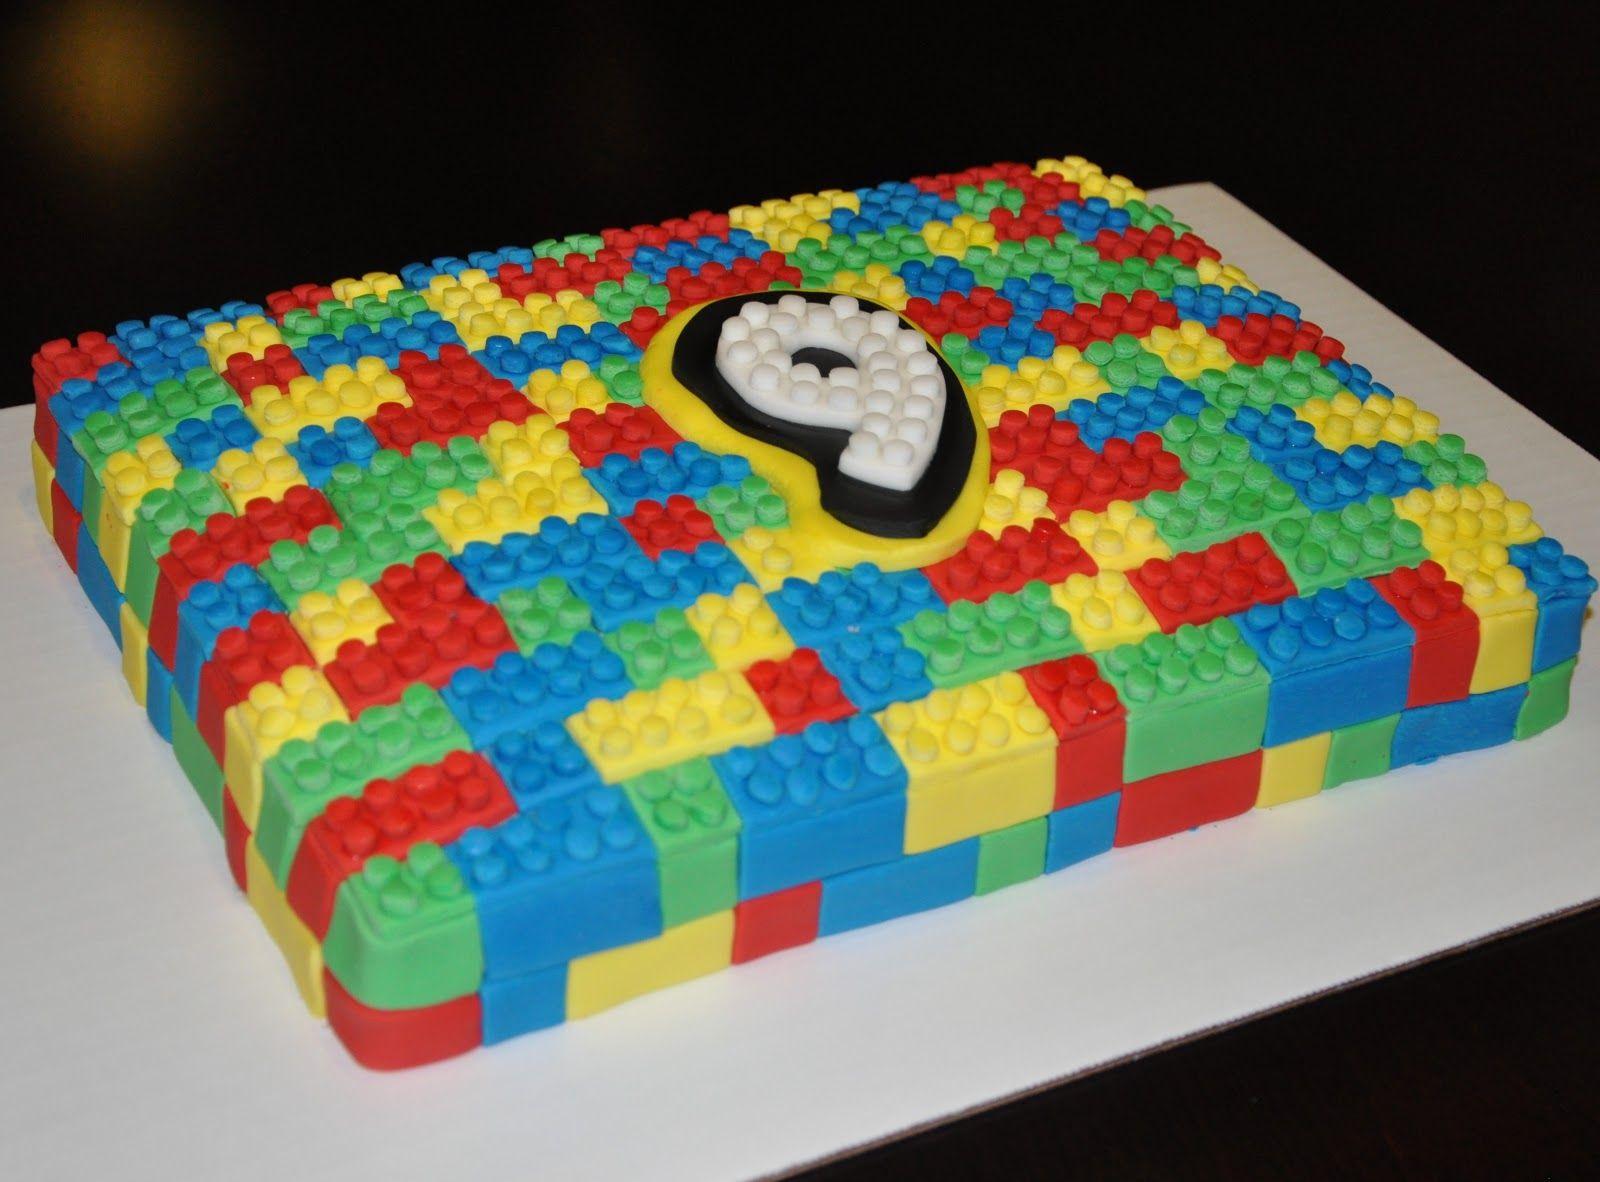 LEGO Birthday Cakes For Boys Birthdaycakespartycakescool - Lego birthday cake decorations